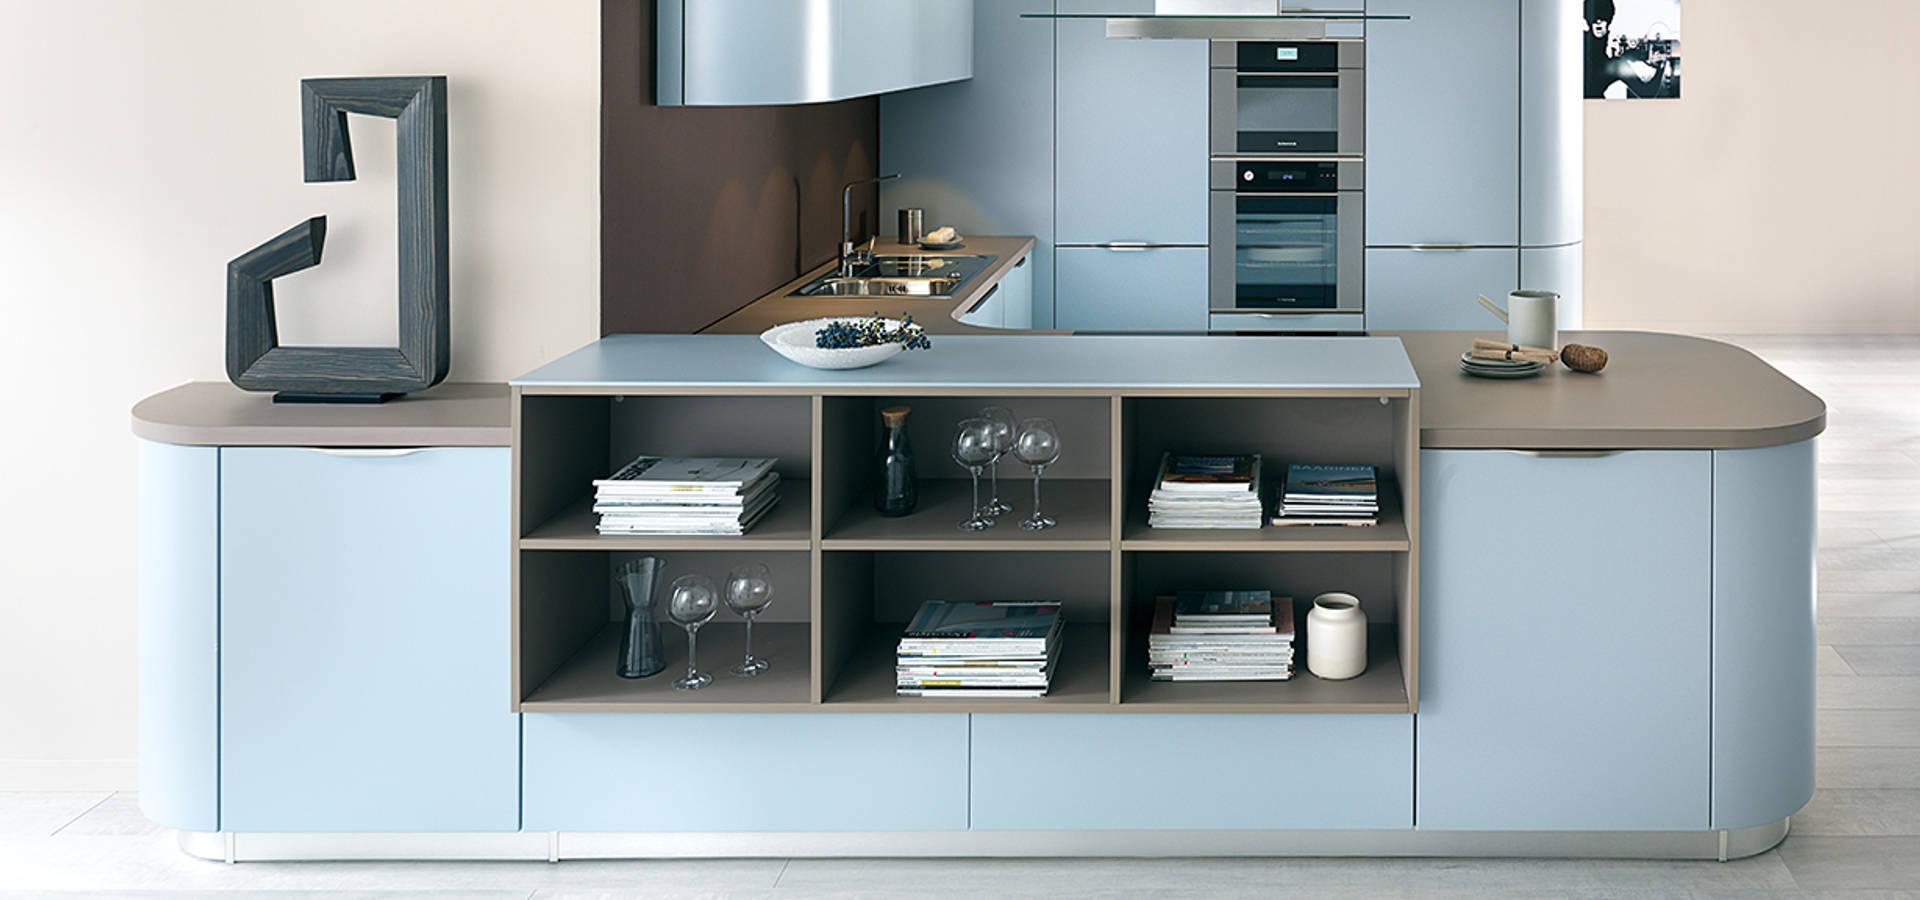 schmidt k chen fabricantes de cozinhas em t rkism hle homify. Black Bedroom Furniture Sets. Home Design Ideas